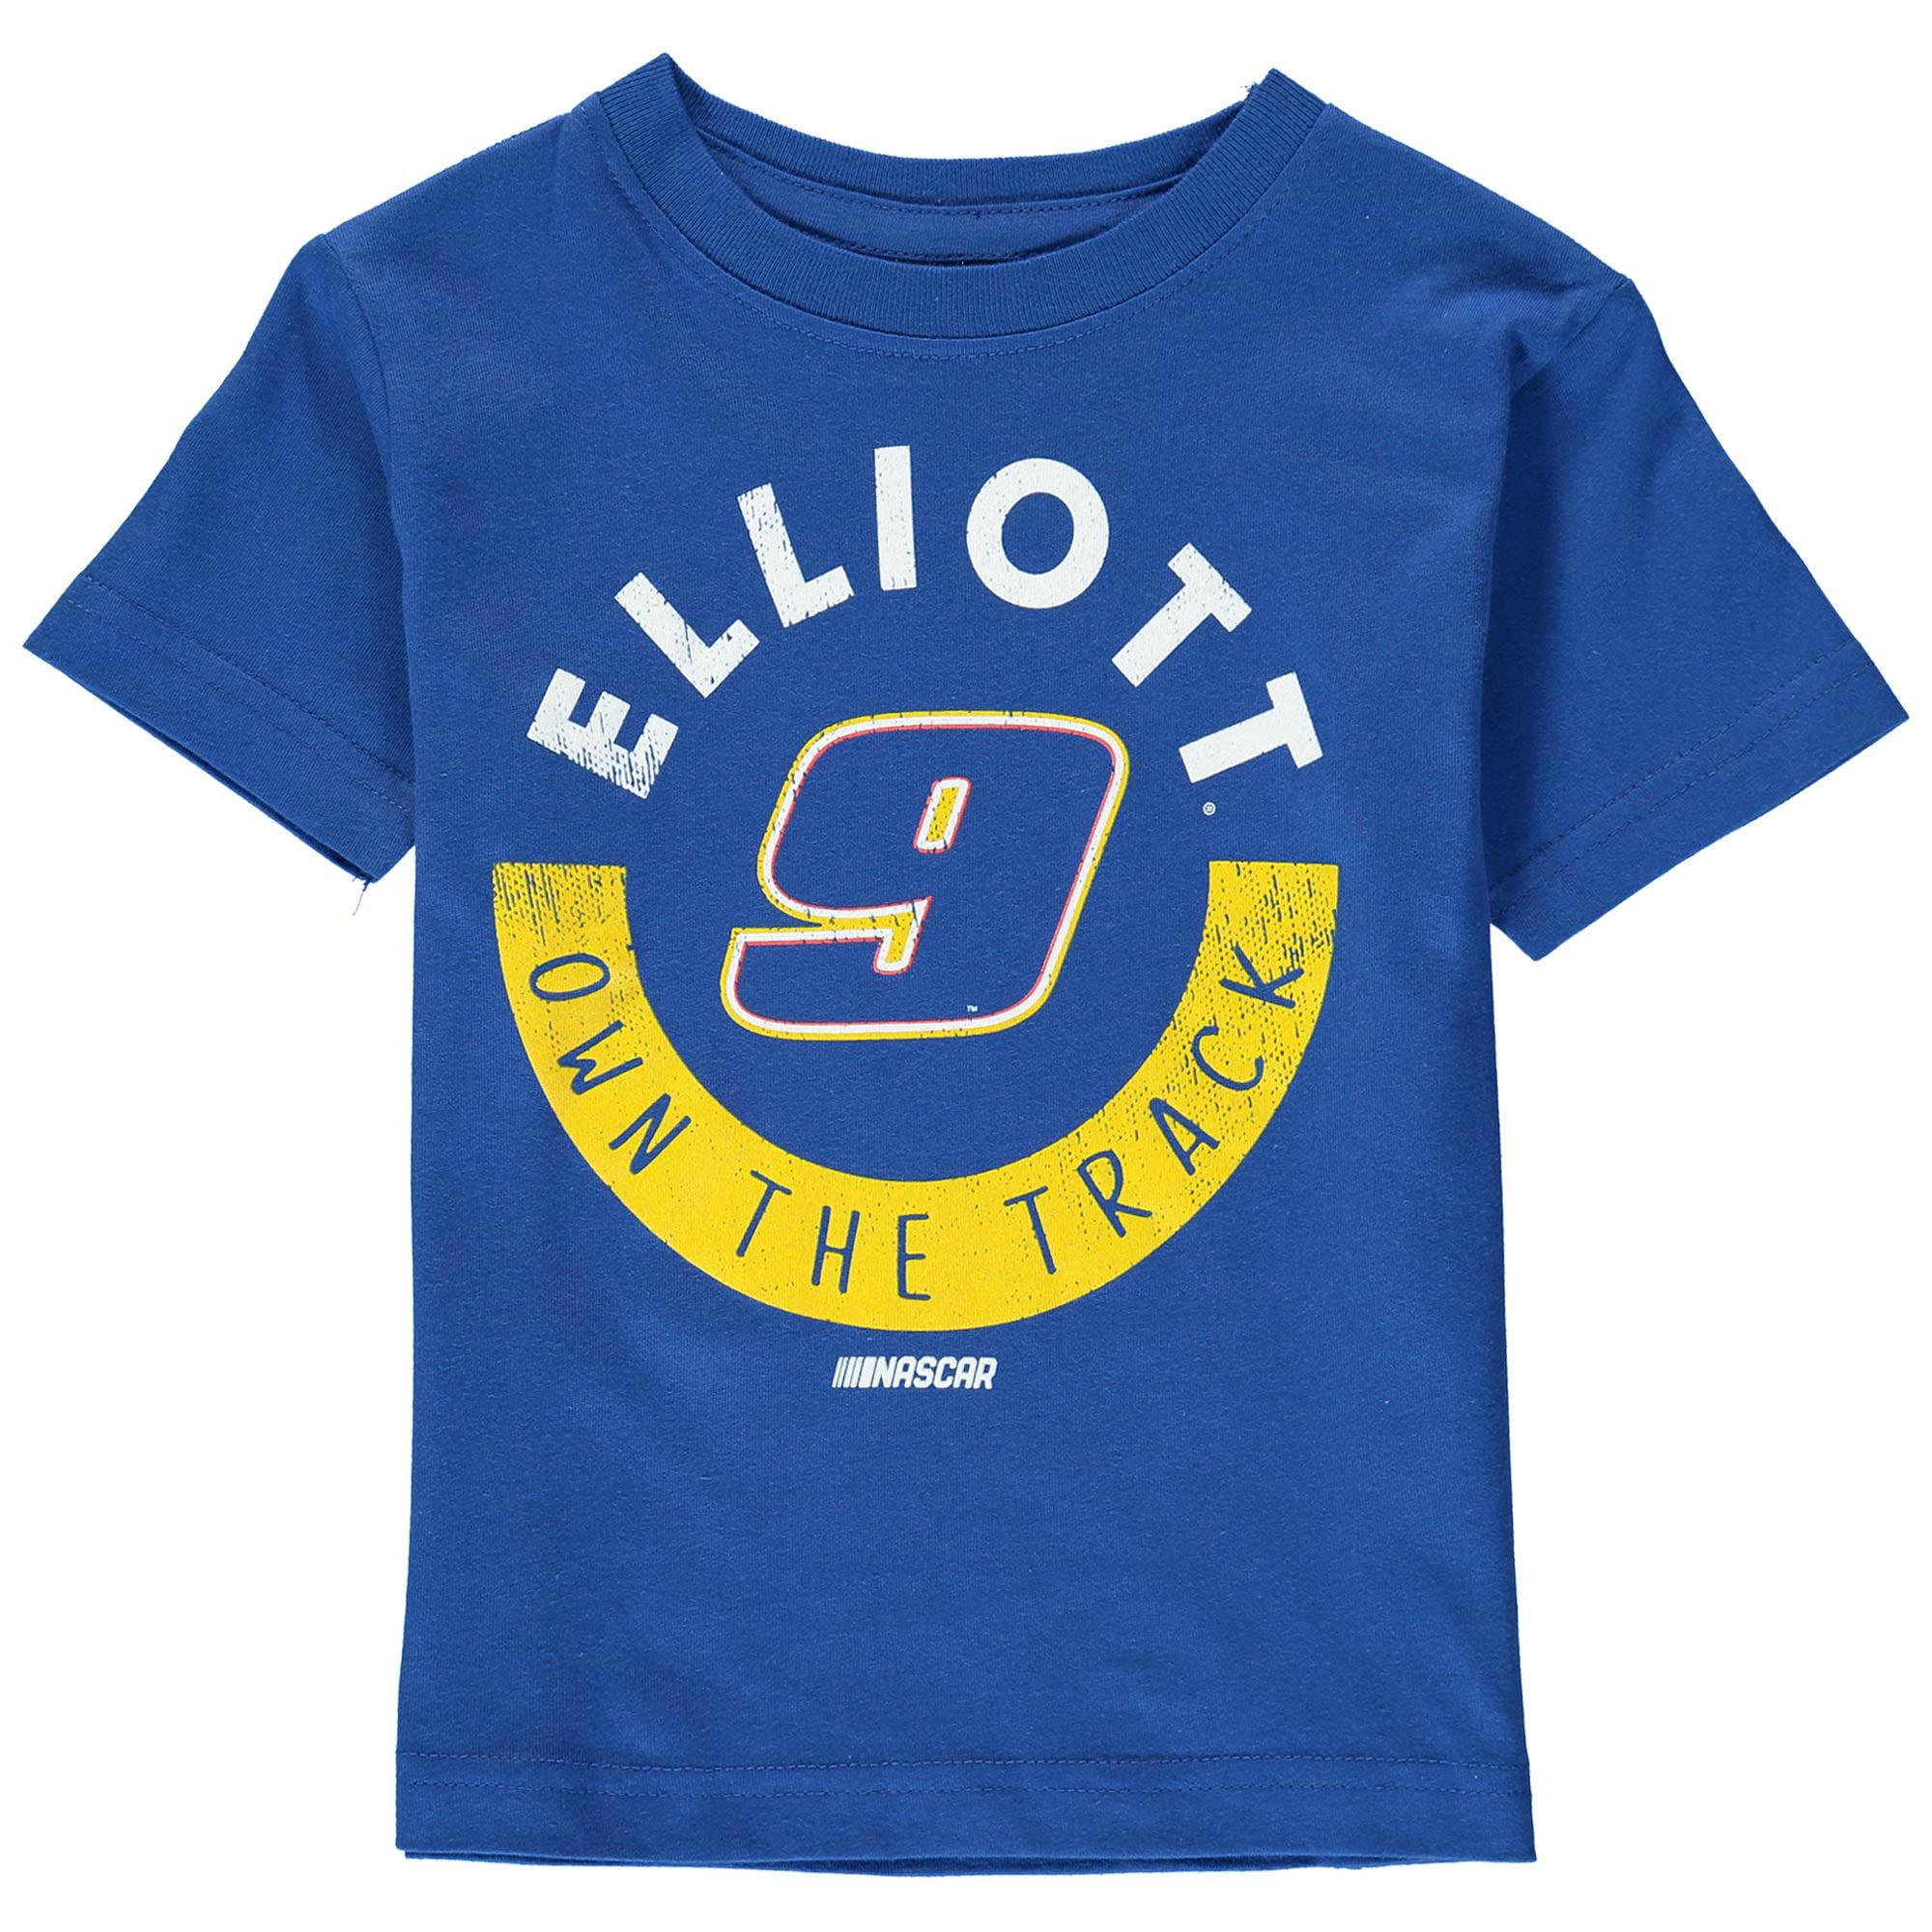 Chase Elliott Fanatics Branded Toddler Distressed T-Shirt - Royal